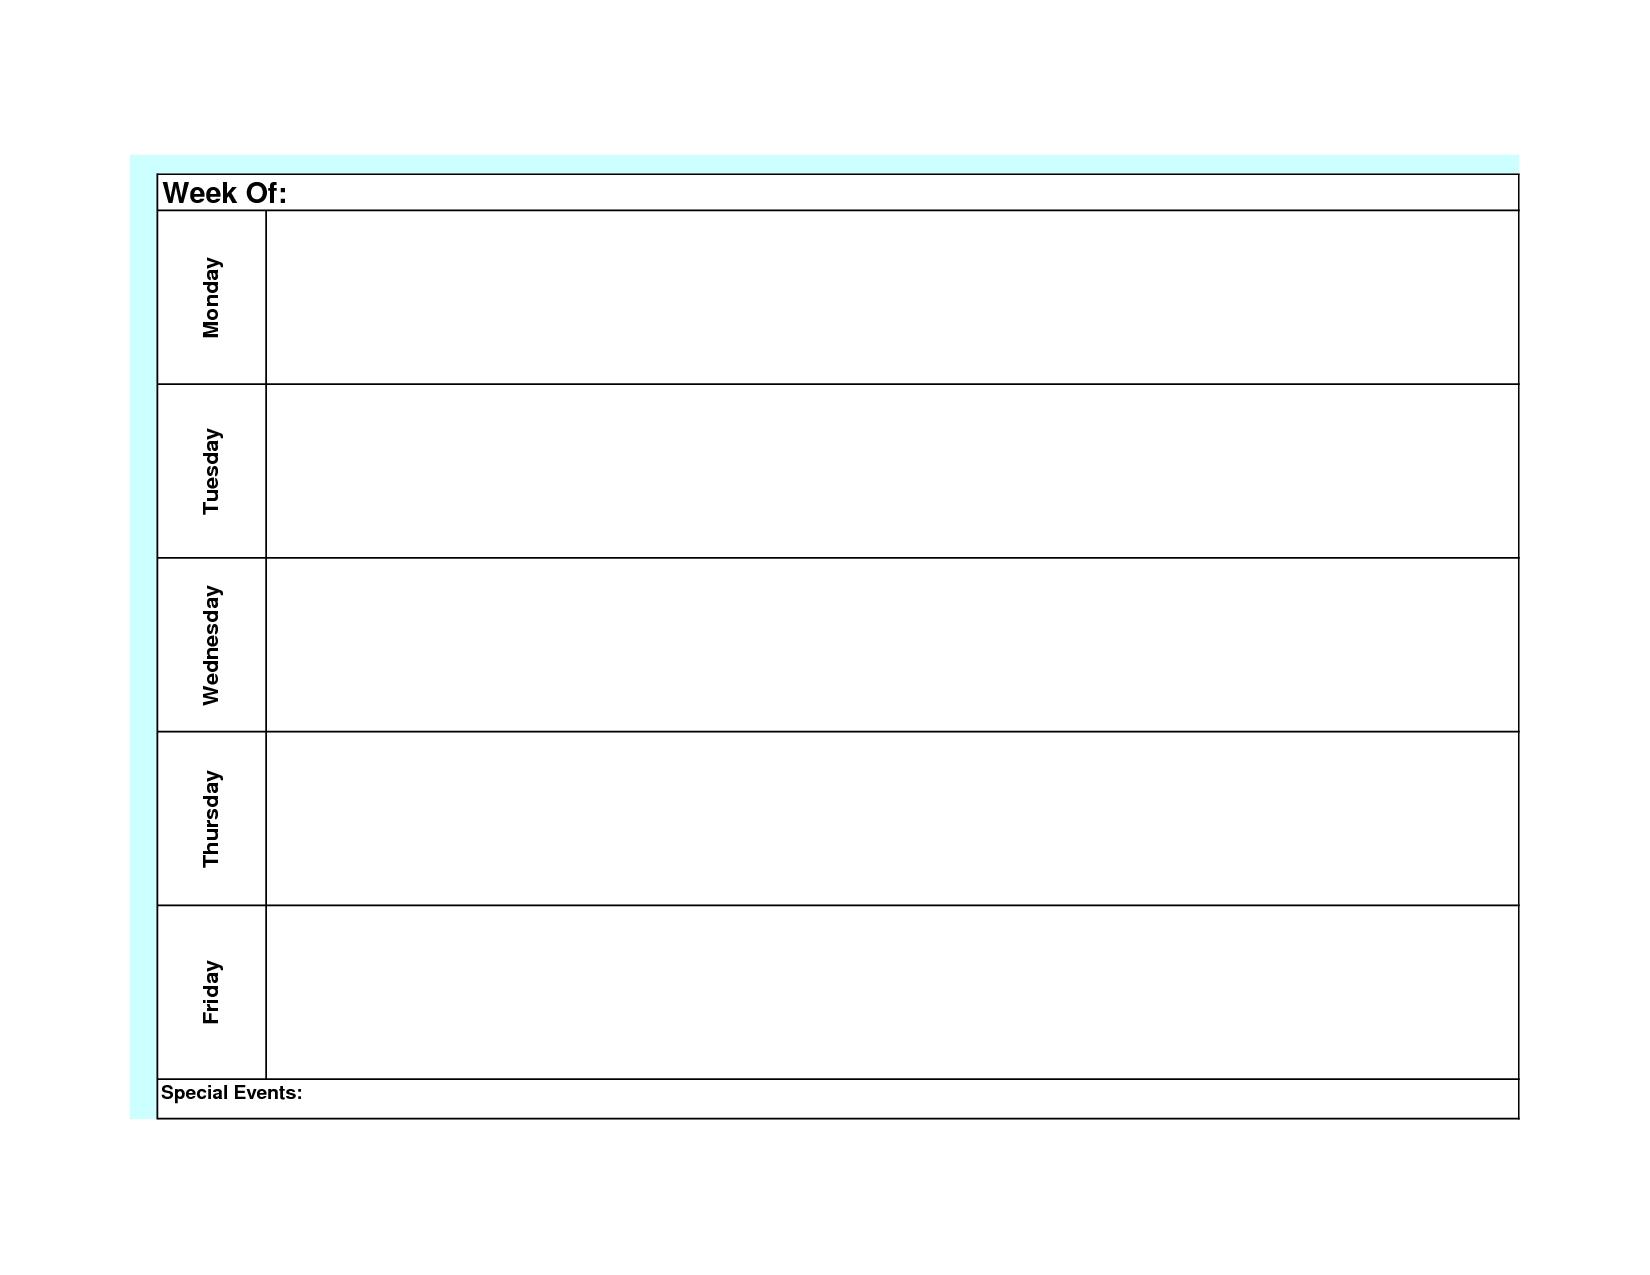 Blank Weekly Calendar Template Monday Friday | Planner | Weekly regarding Pweakley Planner Mon To Sunday